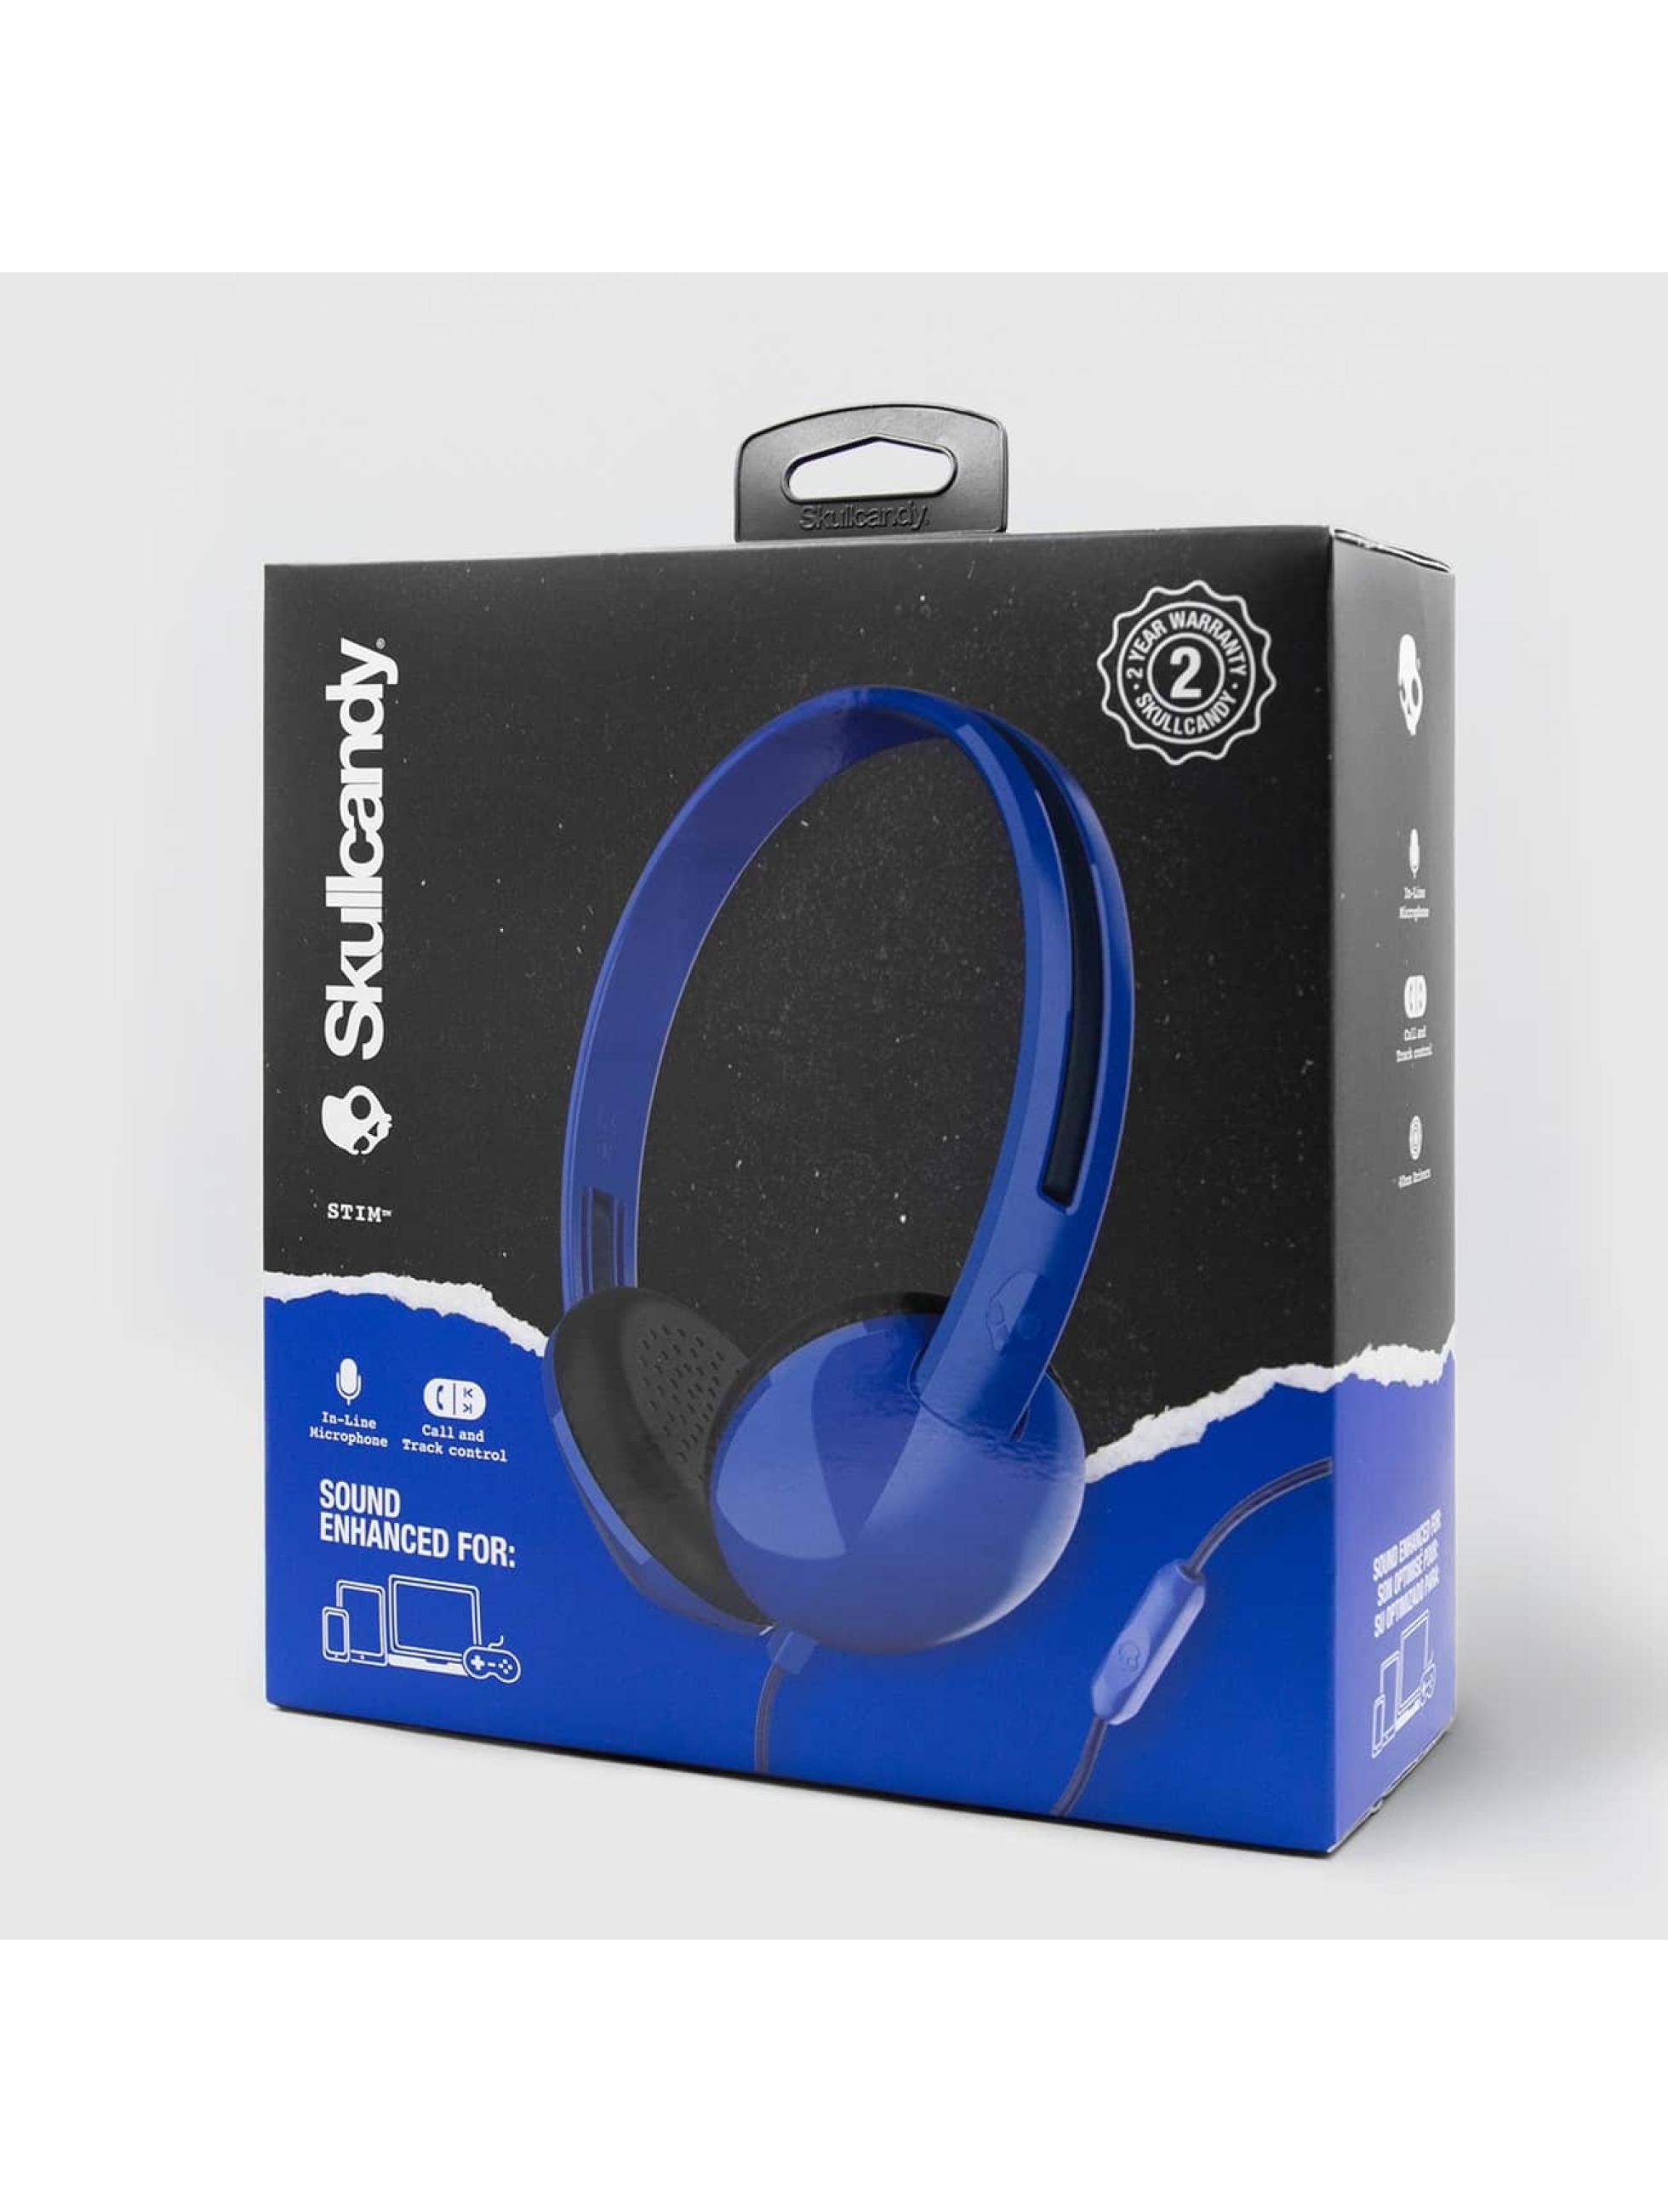 Skullcandy Koptelefoon Stim Mic 1 On Ear blauw